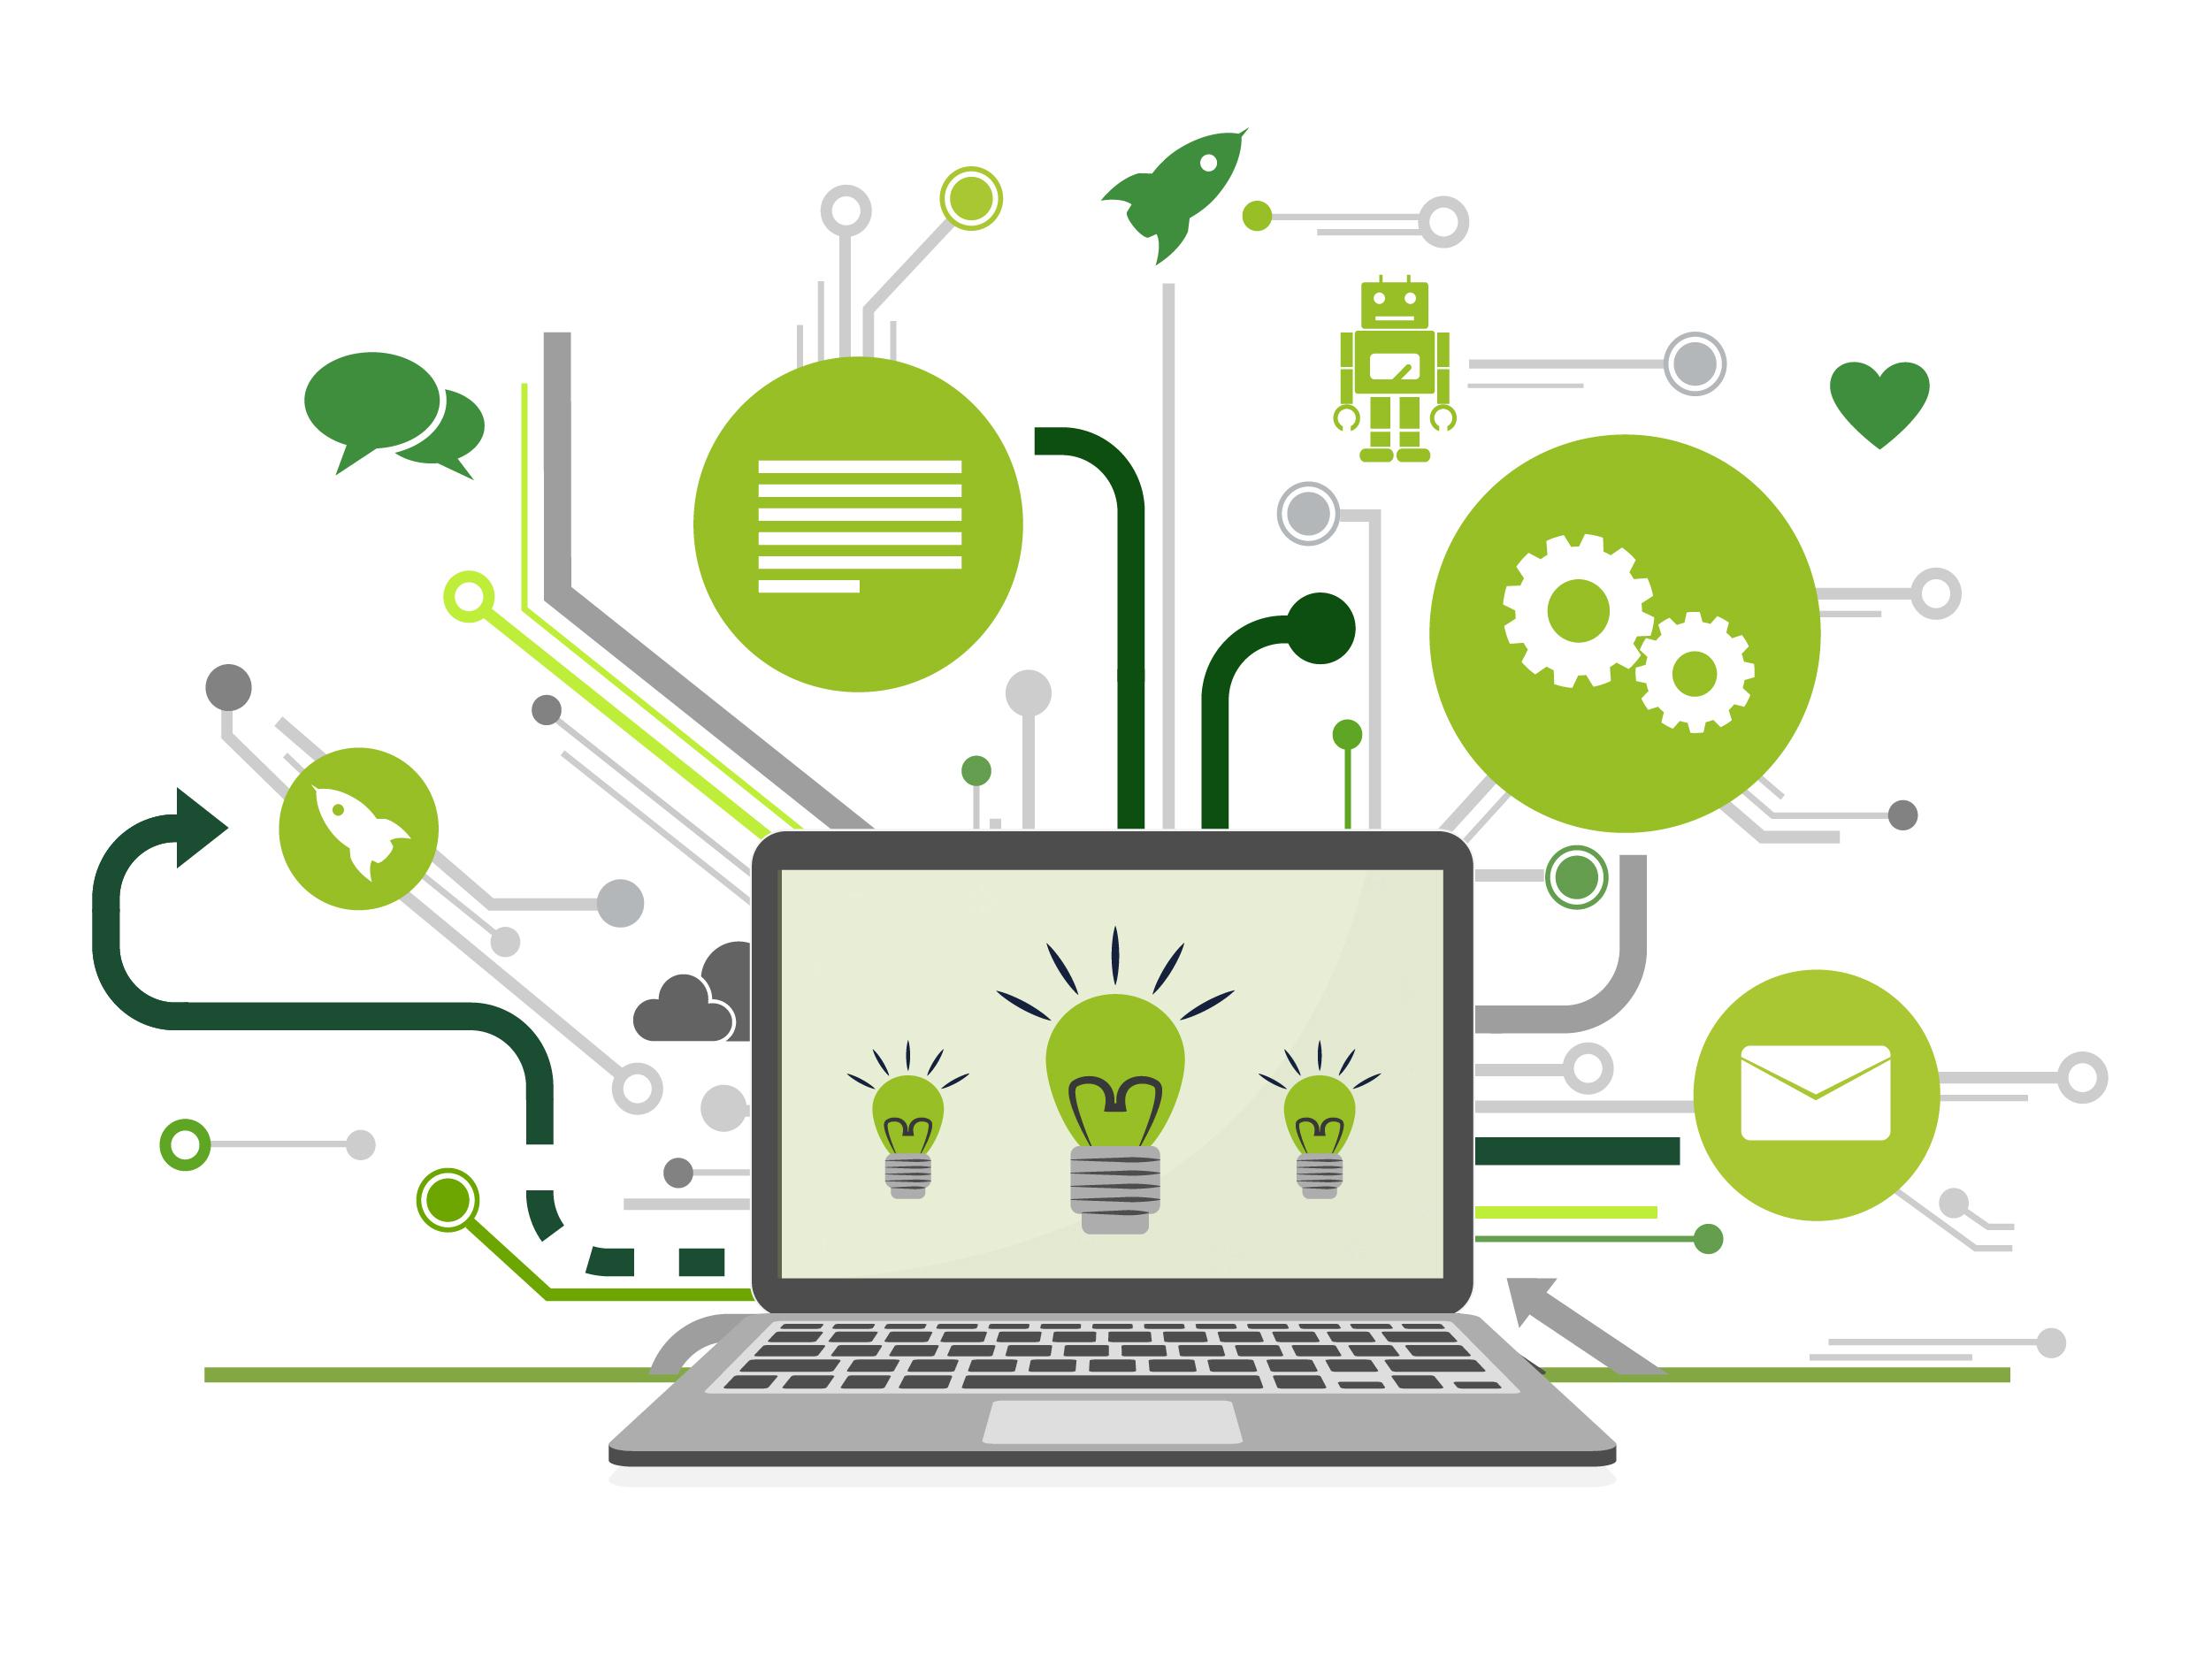 Digital Innovation by Digital Marketing Experts